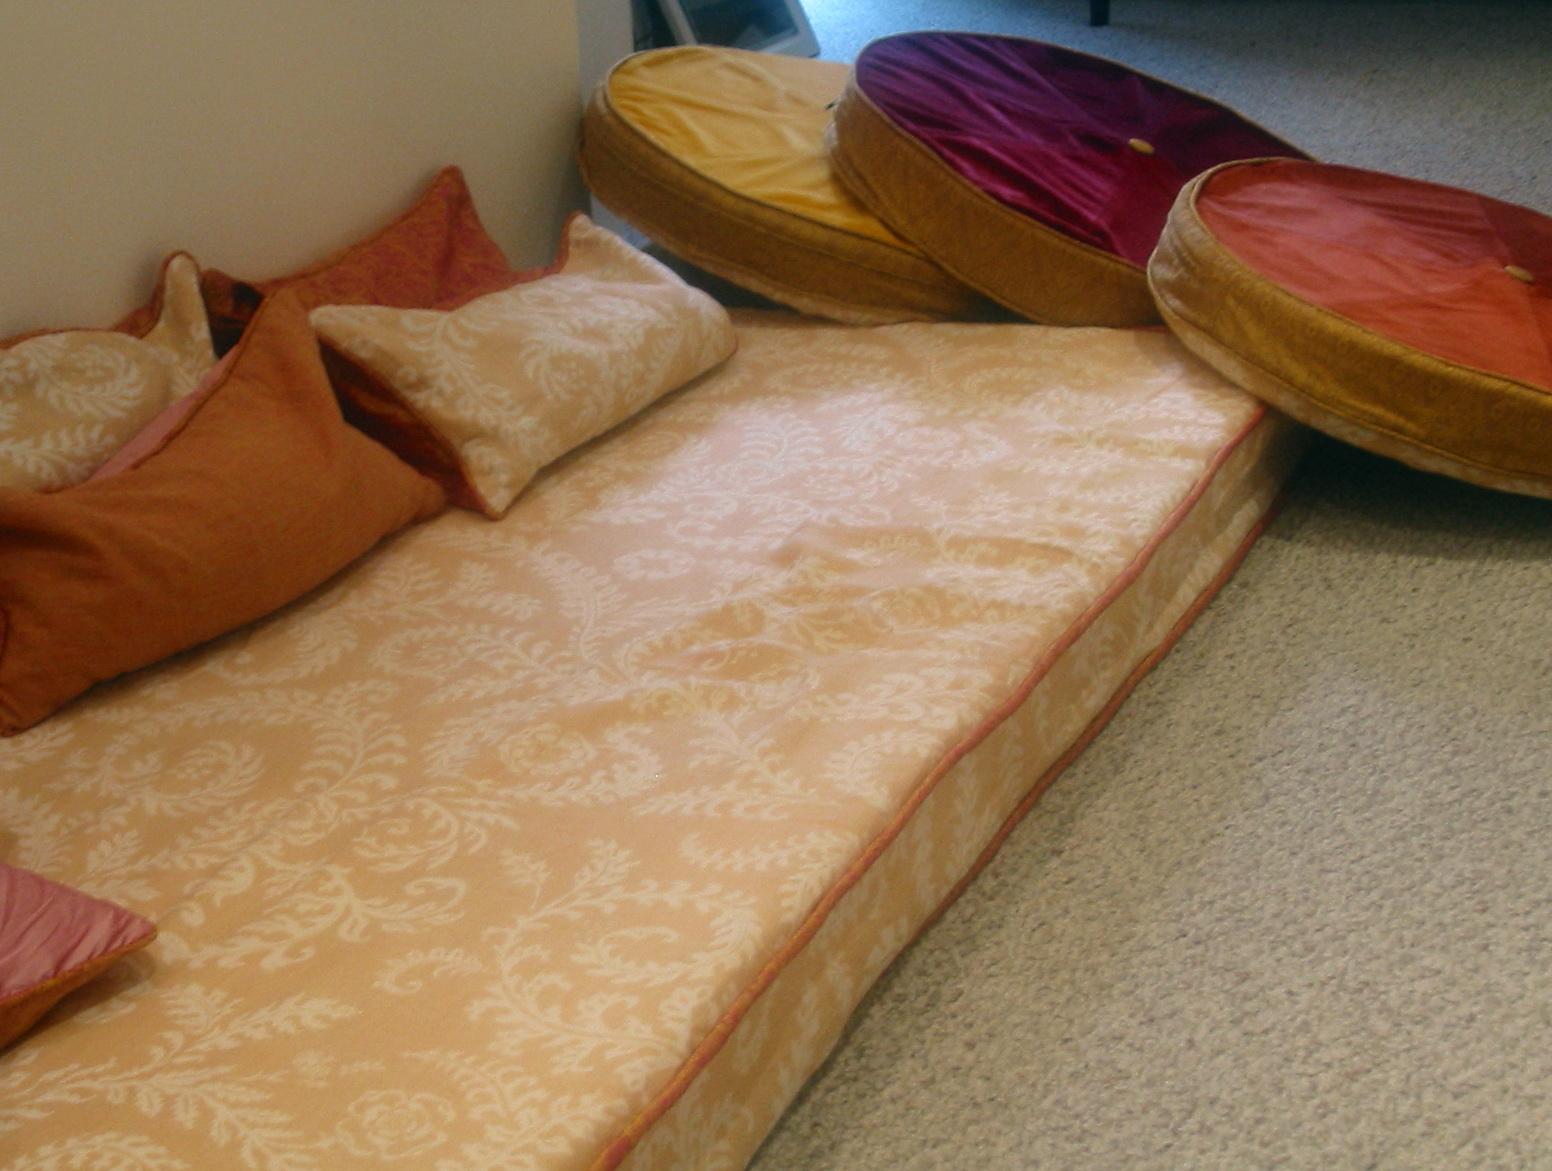 Floor Seating Cushions Walmart | Home Design Ideas